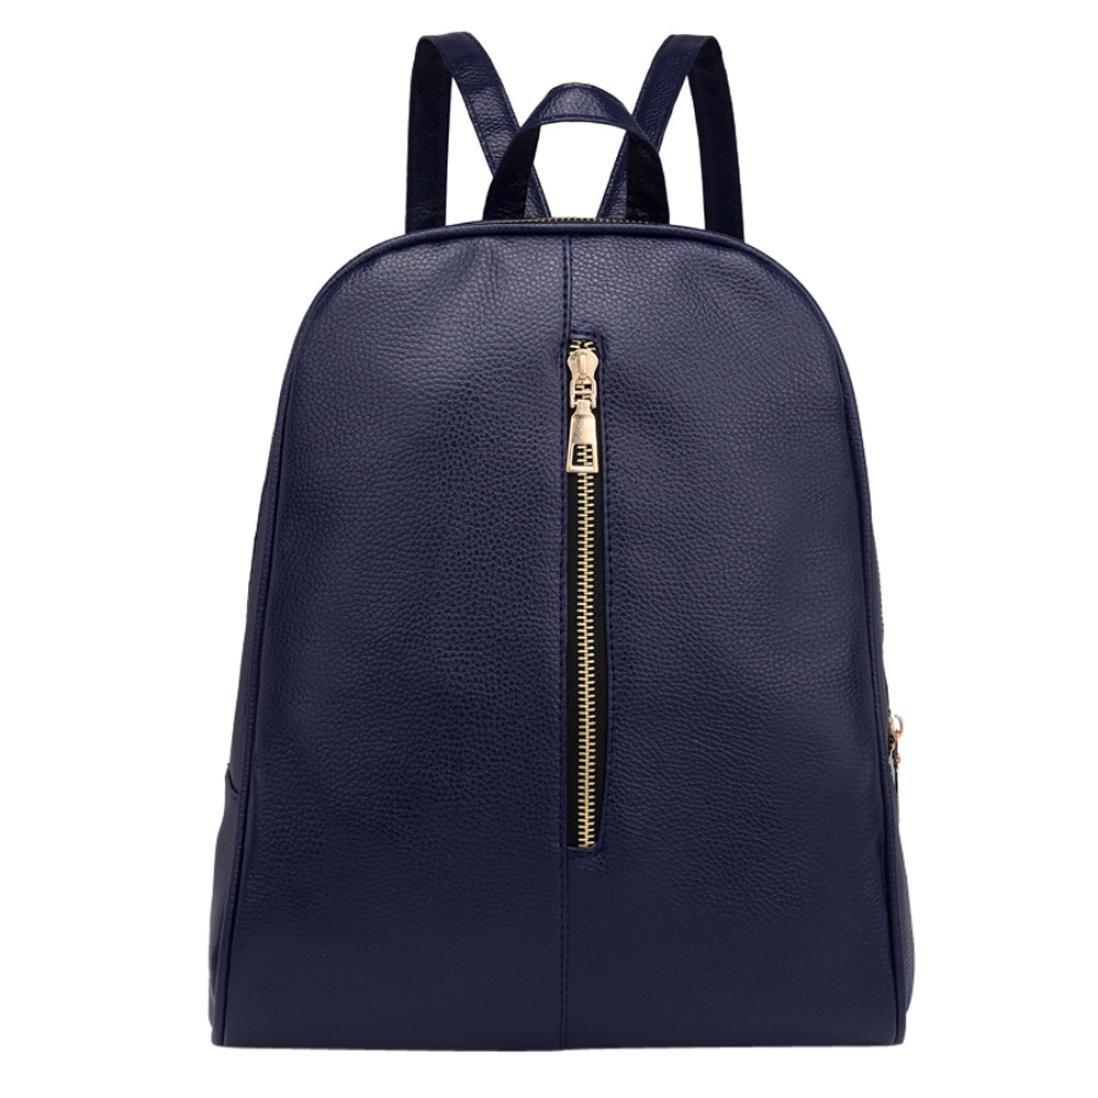 Amazon.com: YJYDADA Bags,Woman Fashion Leather Backpack Female Preppy Style Zipper Mochila School Bag (Deep Blue): Kitchen & Dining